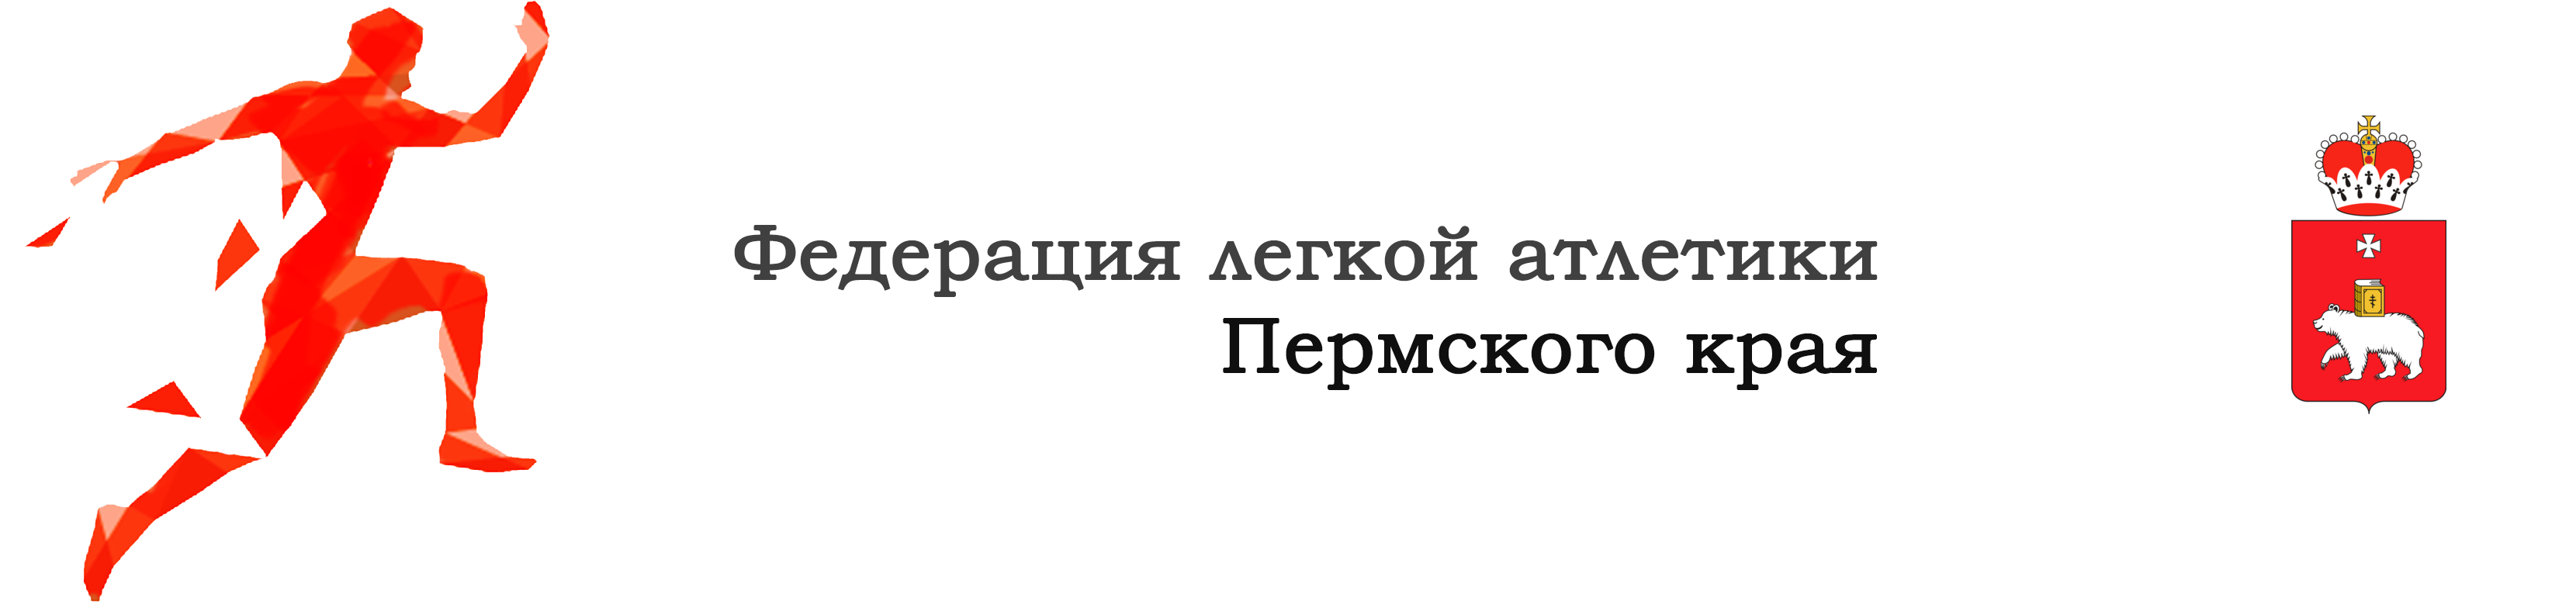 flapk.ru